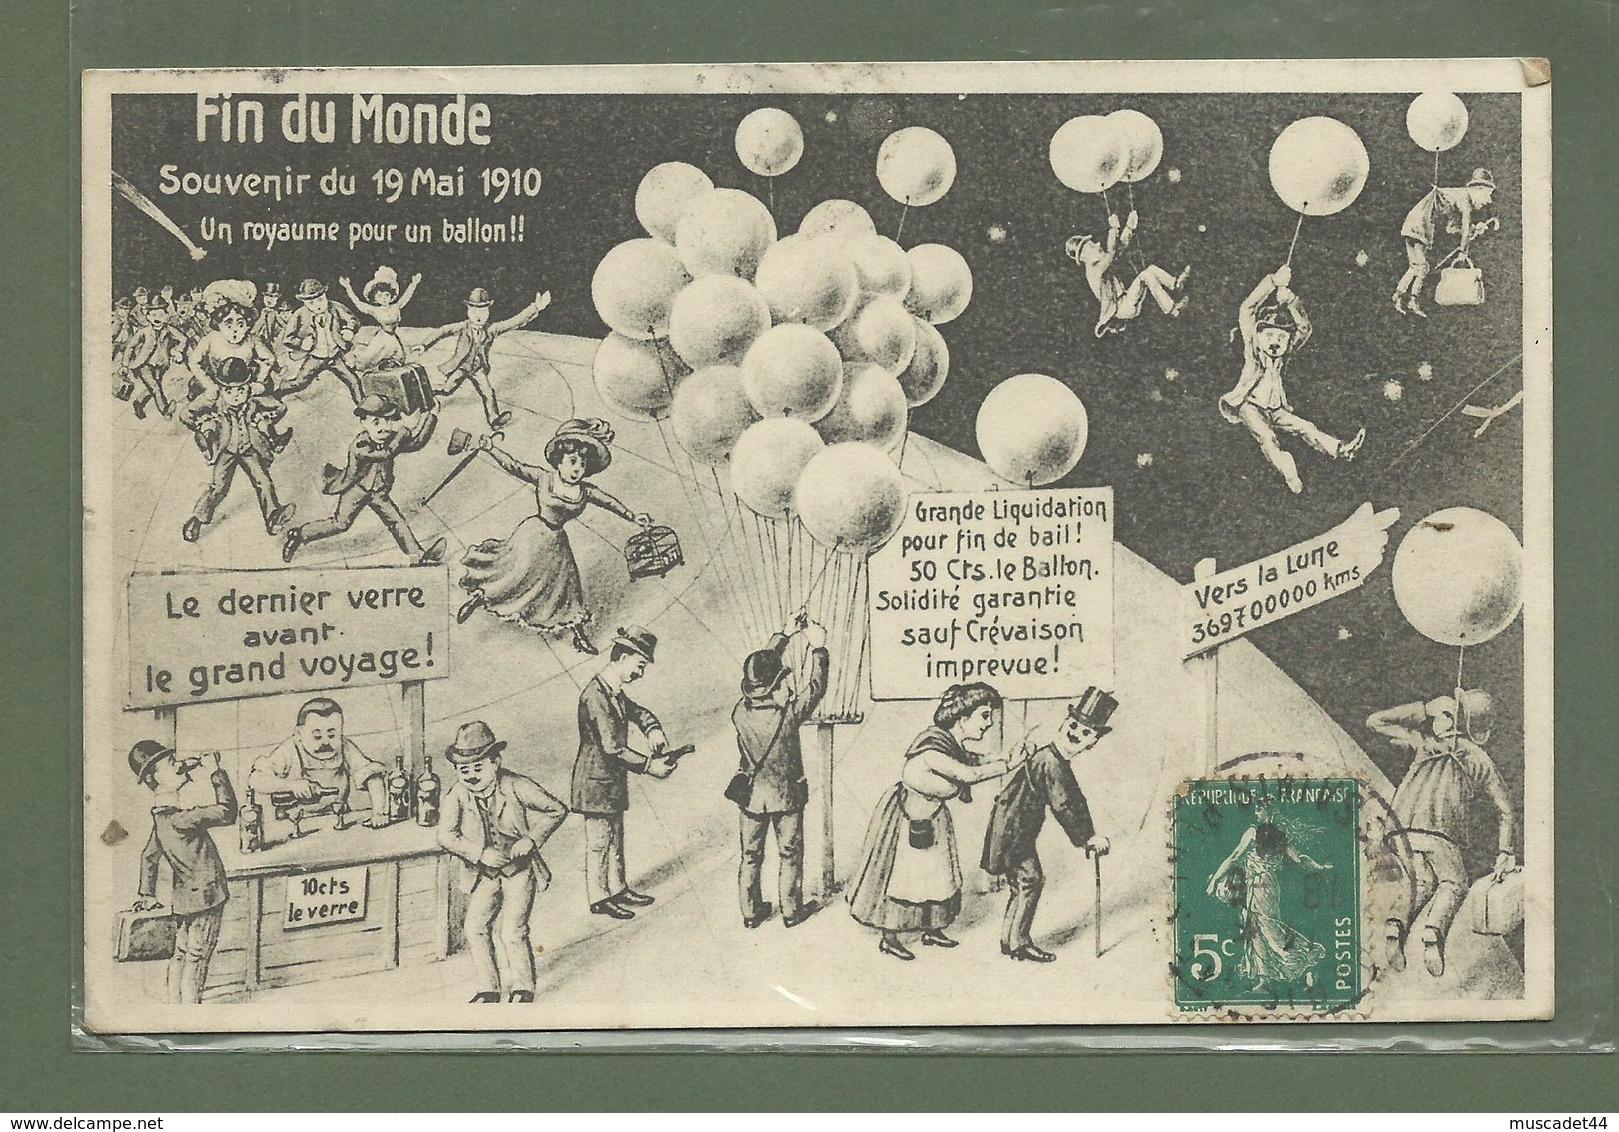 CARTE POSTALE FIN DU MONDE SOUVENIR DU 19 MAI 1910 UFOLOGIE - Other